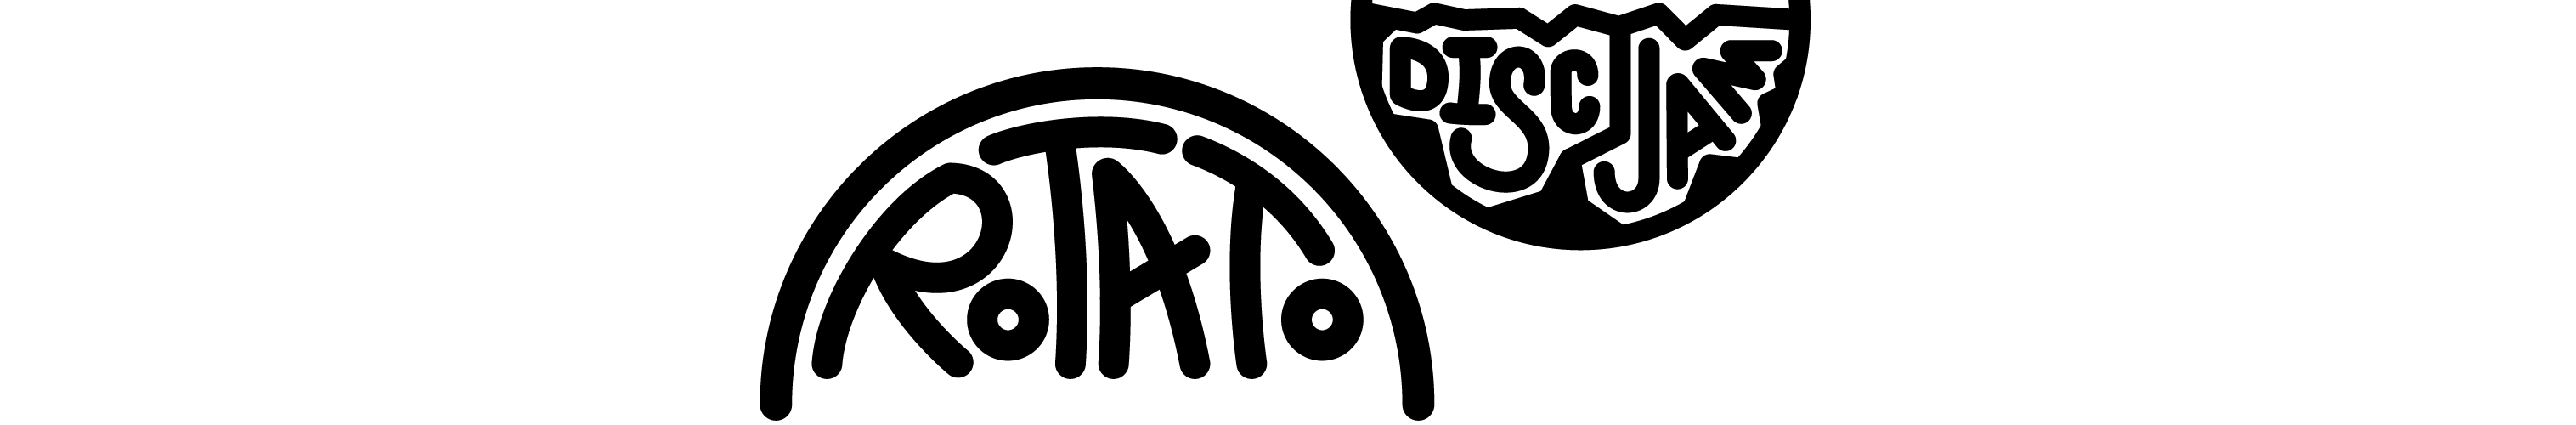 Rotato Disc Jam